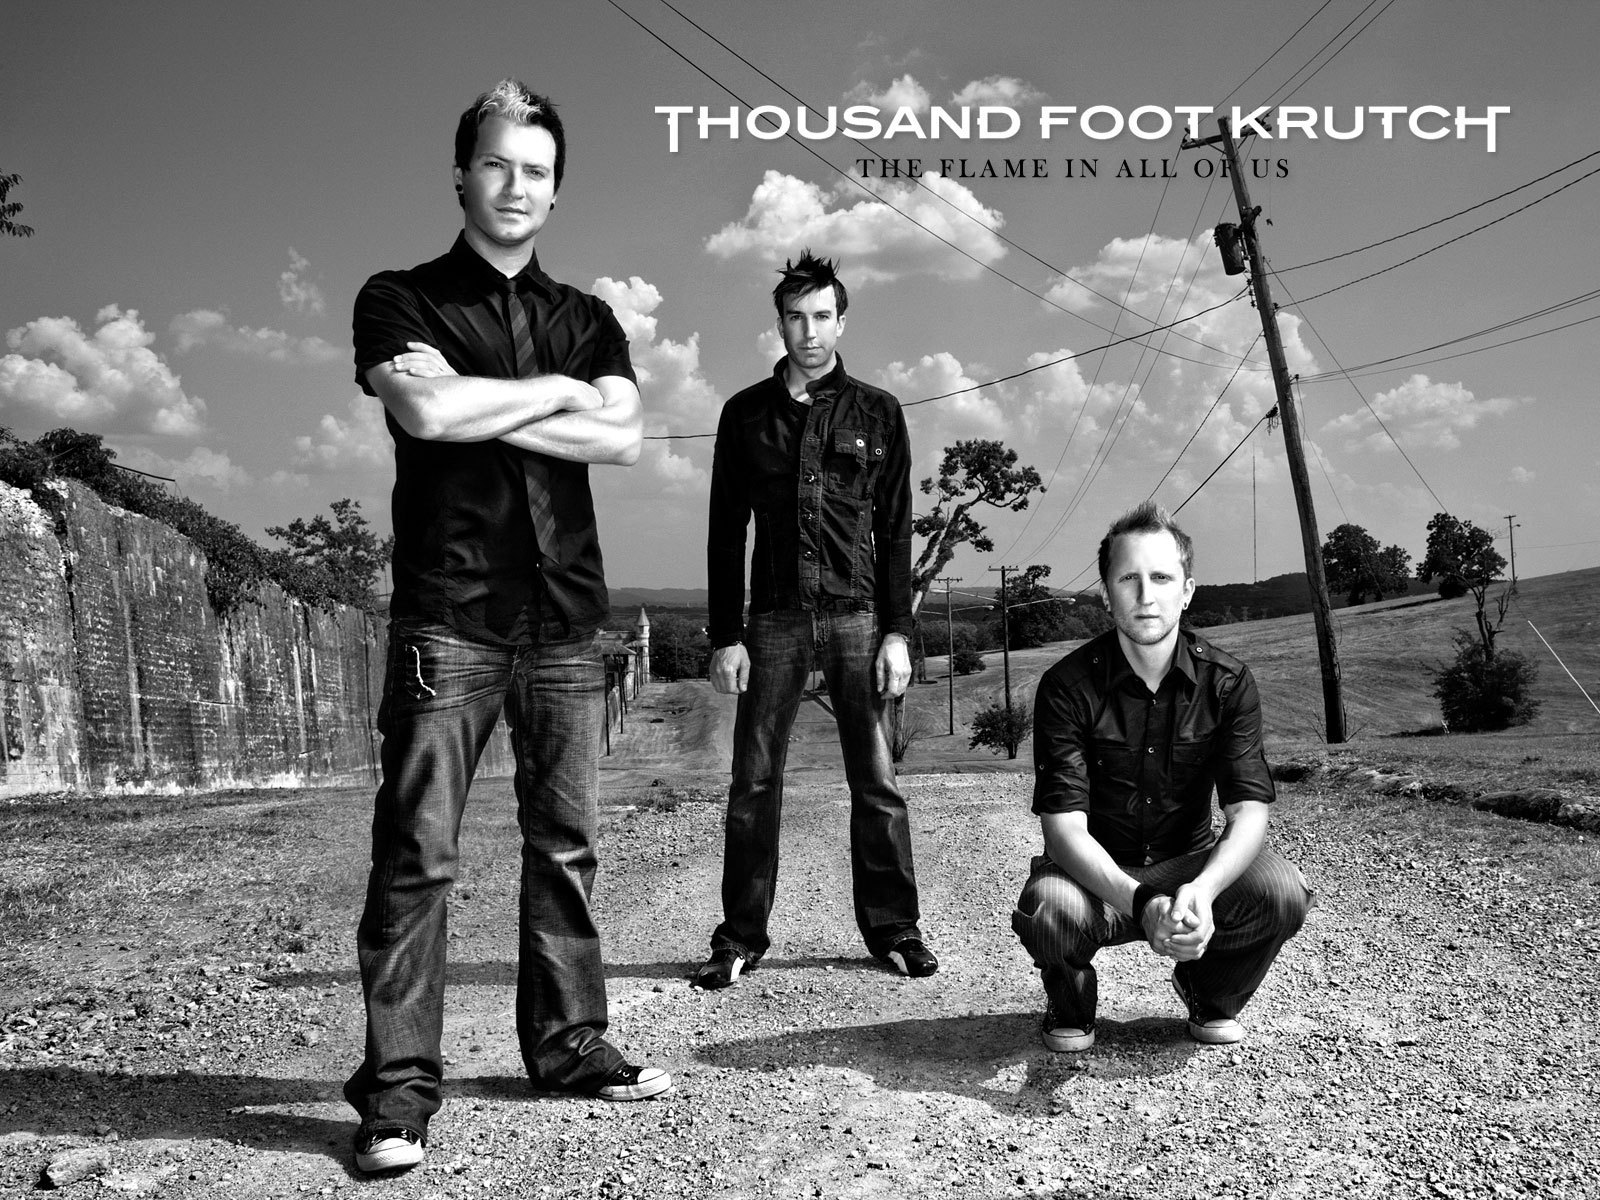 Thousand Foot Krutch images Thousand Foot Krutch HD wallpaper and 1600x1200